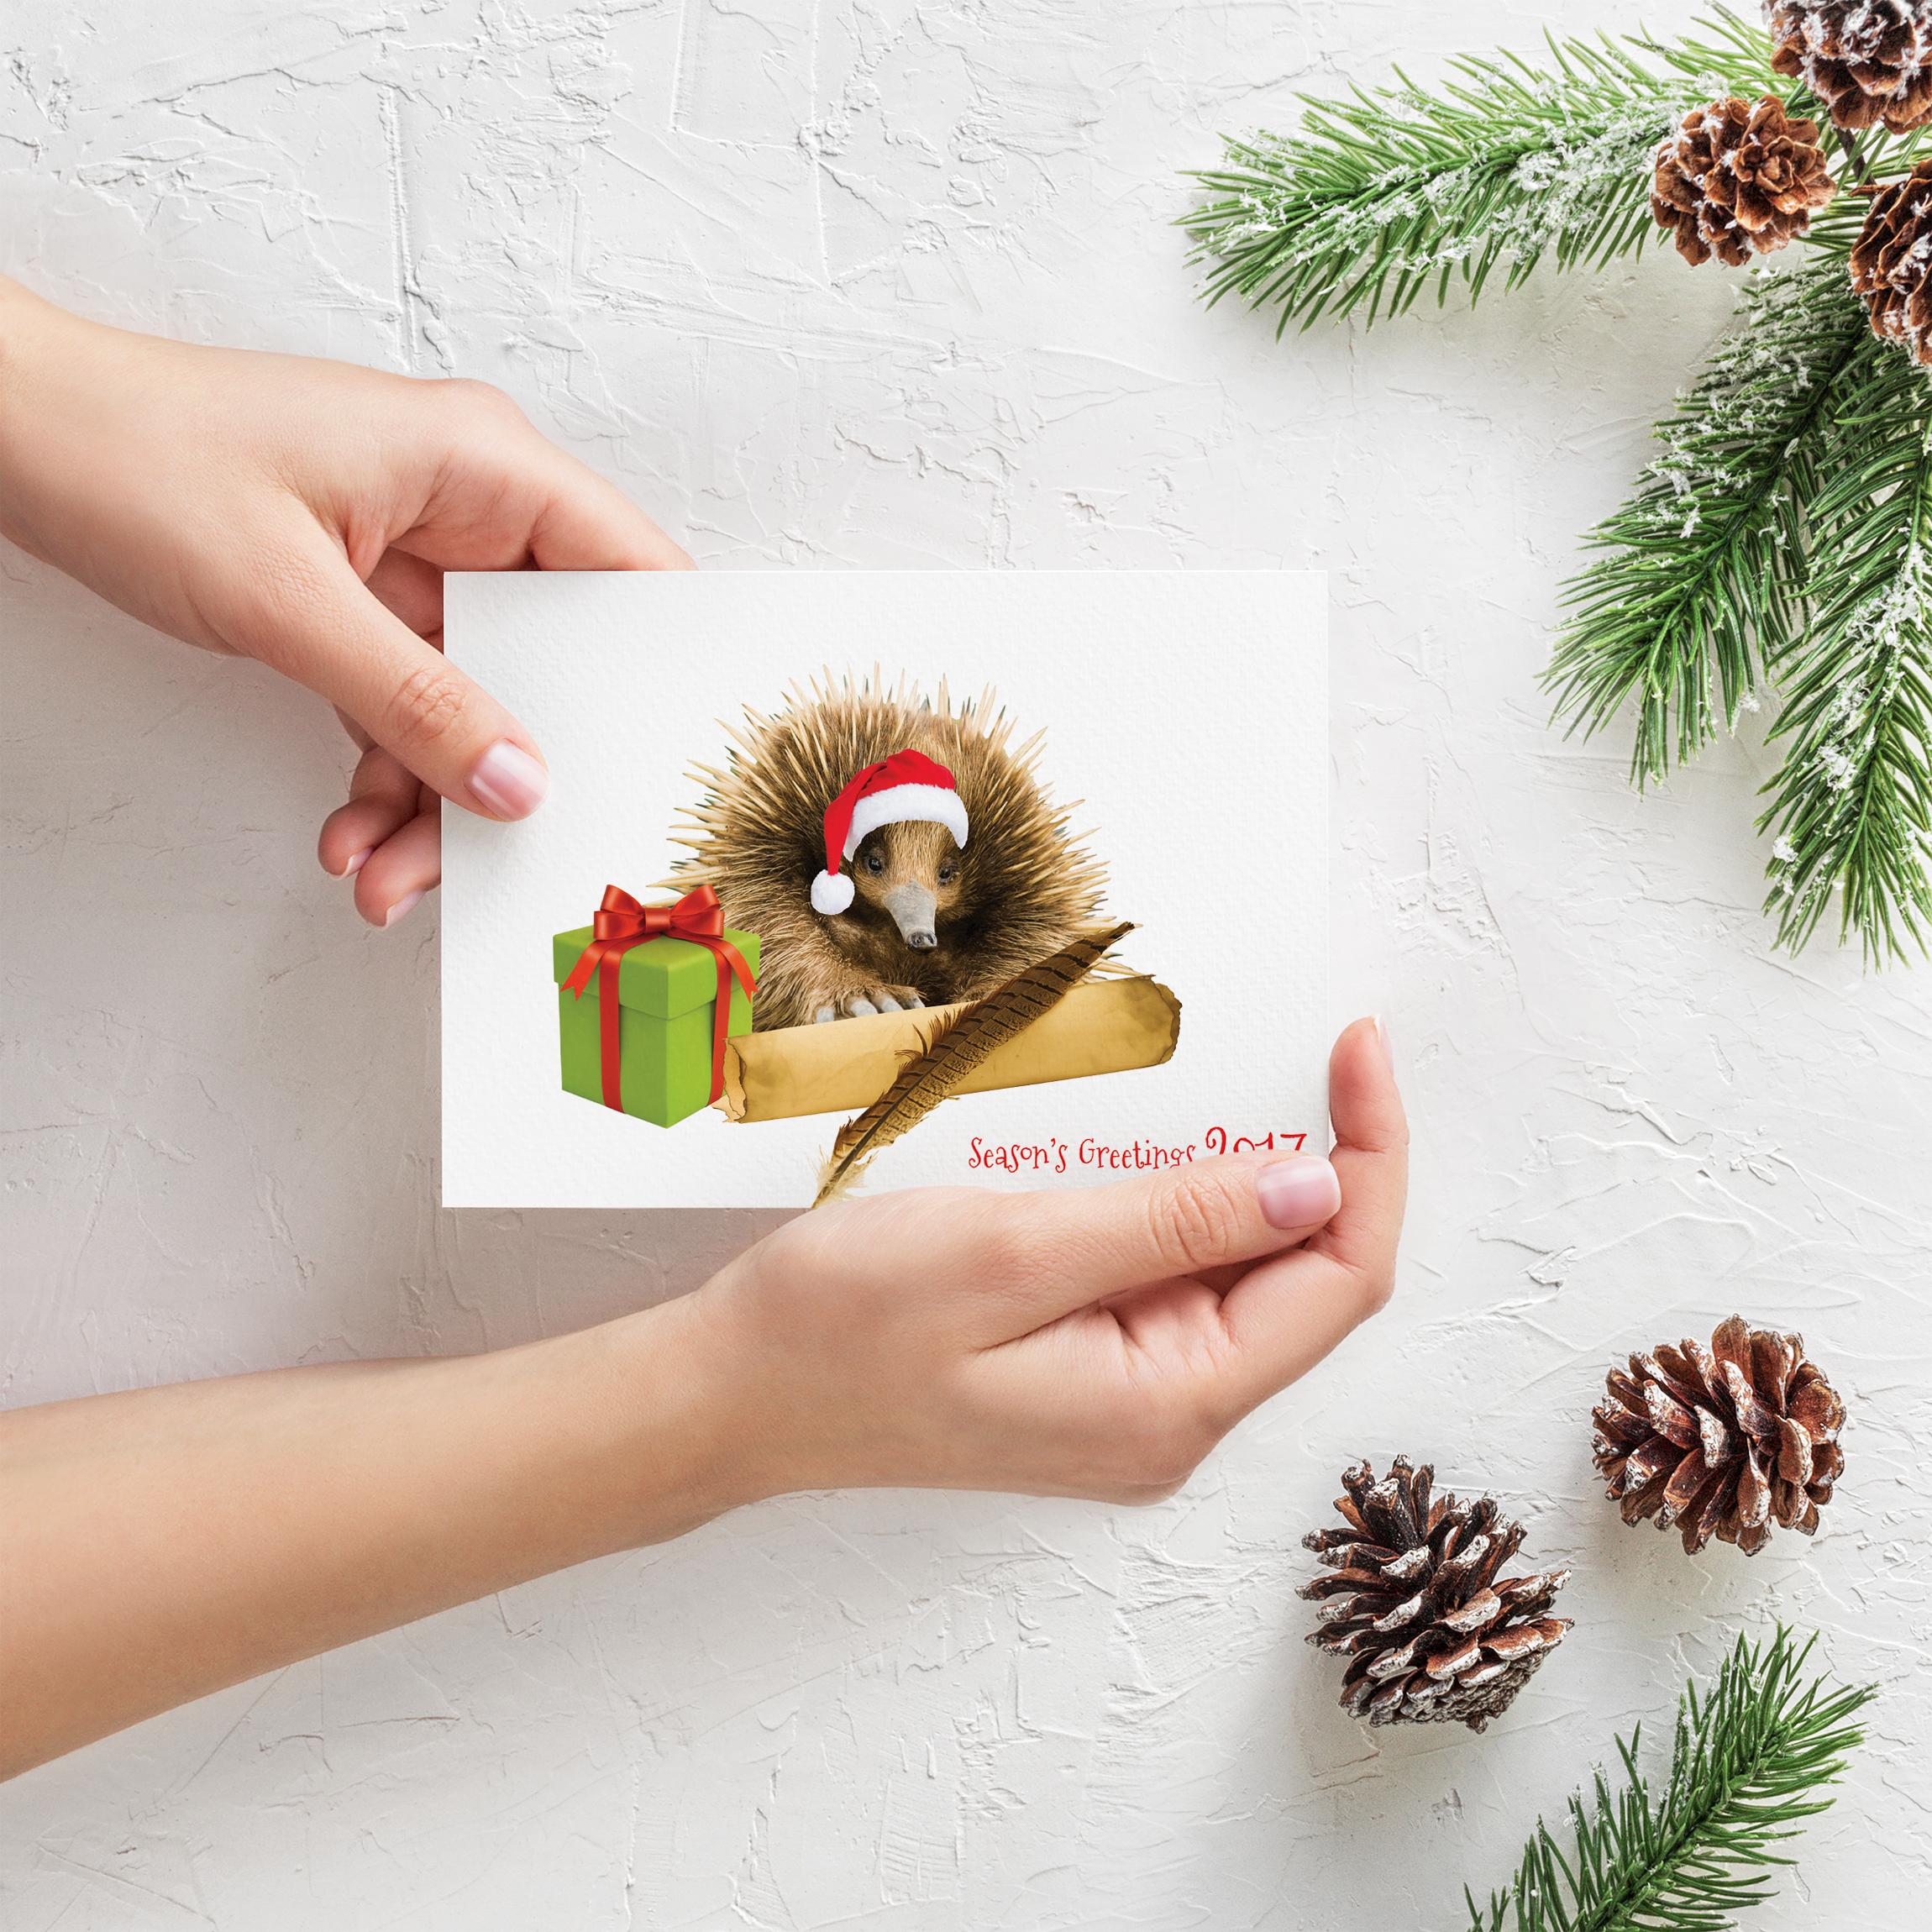 APAP Events Event Management and Graphic Design Rockhampton Bidgerdii Christmas Card 2017